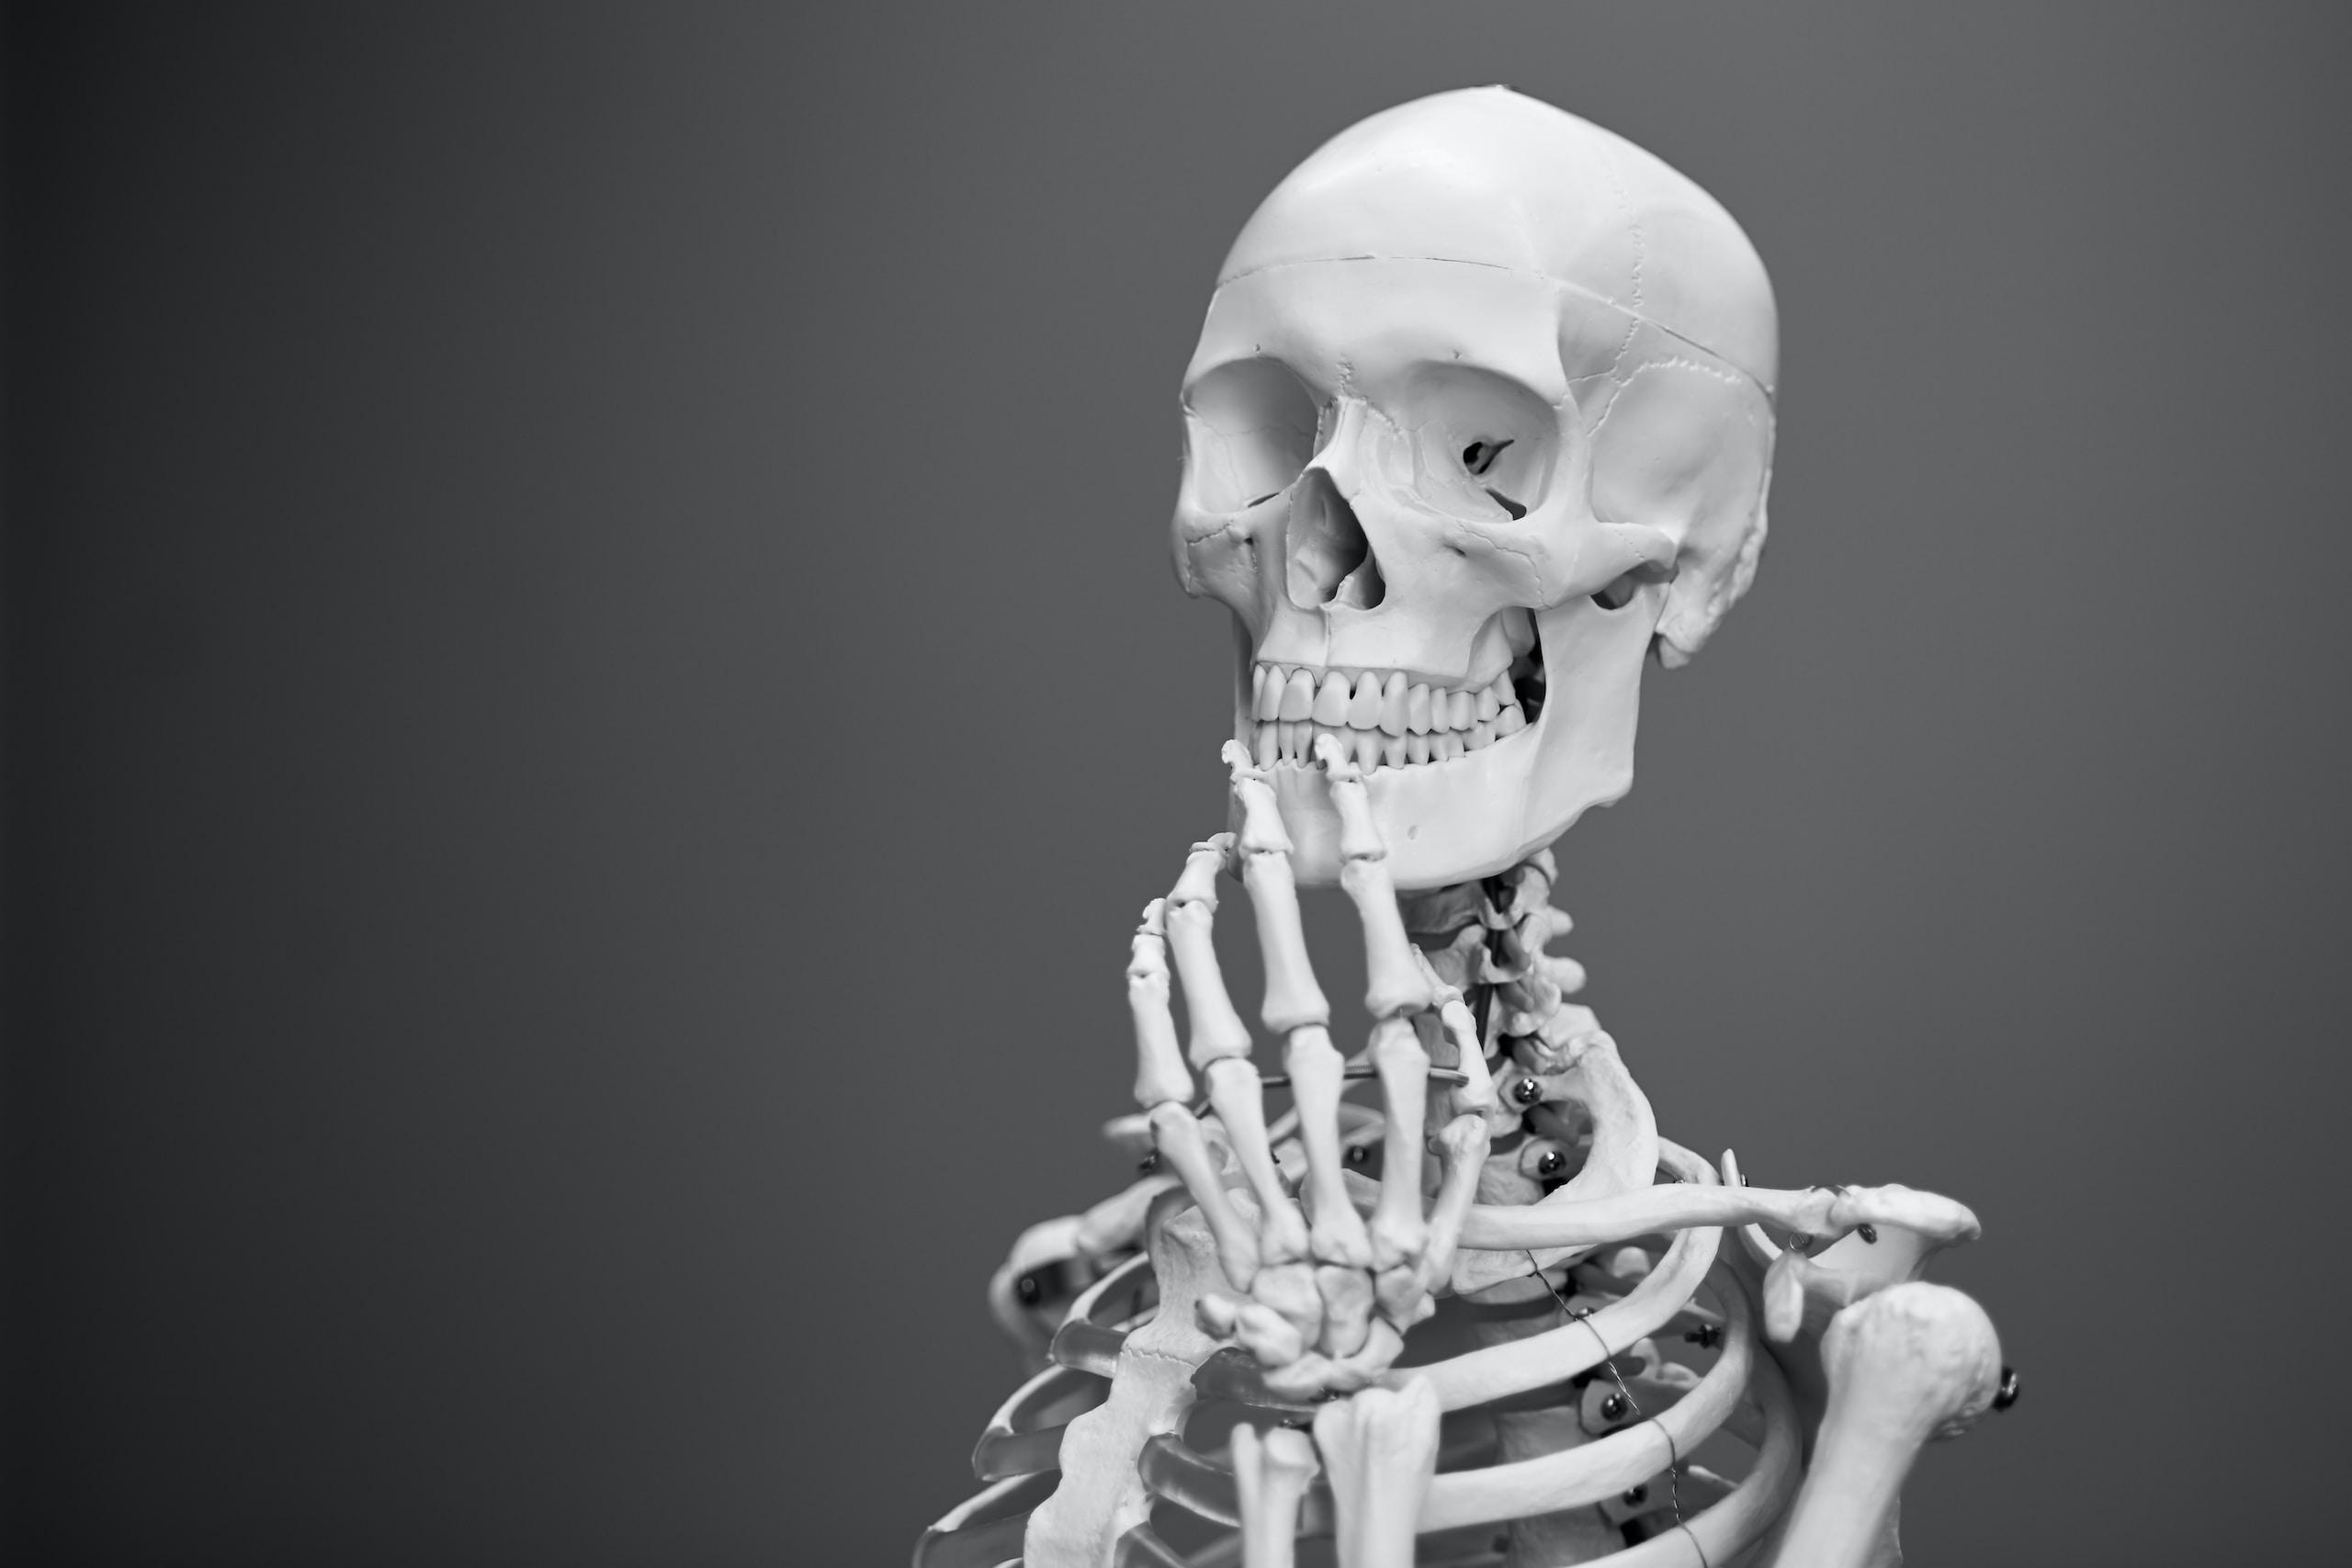 greyscale photography of skeleton